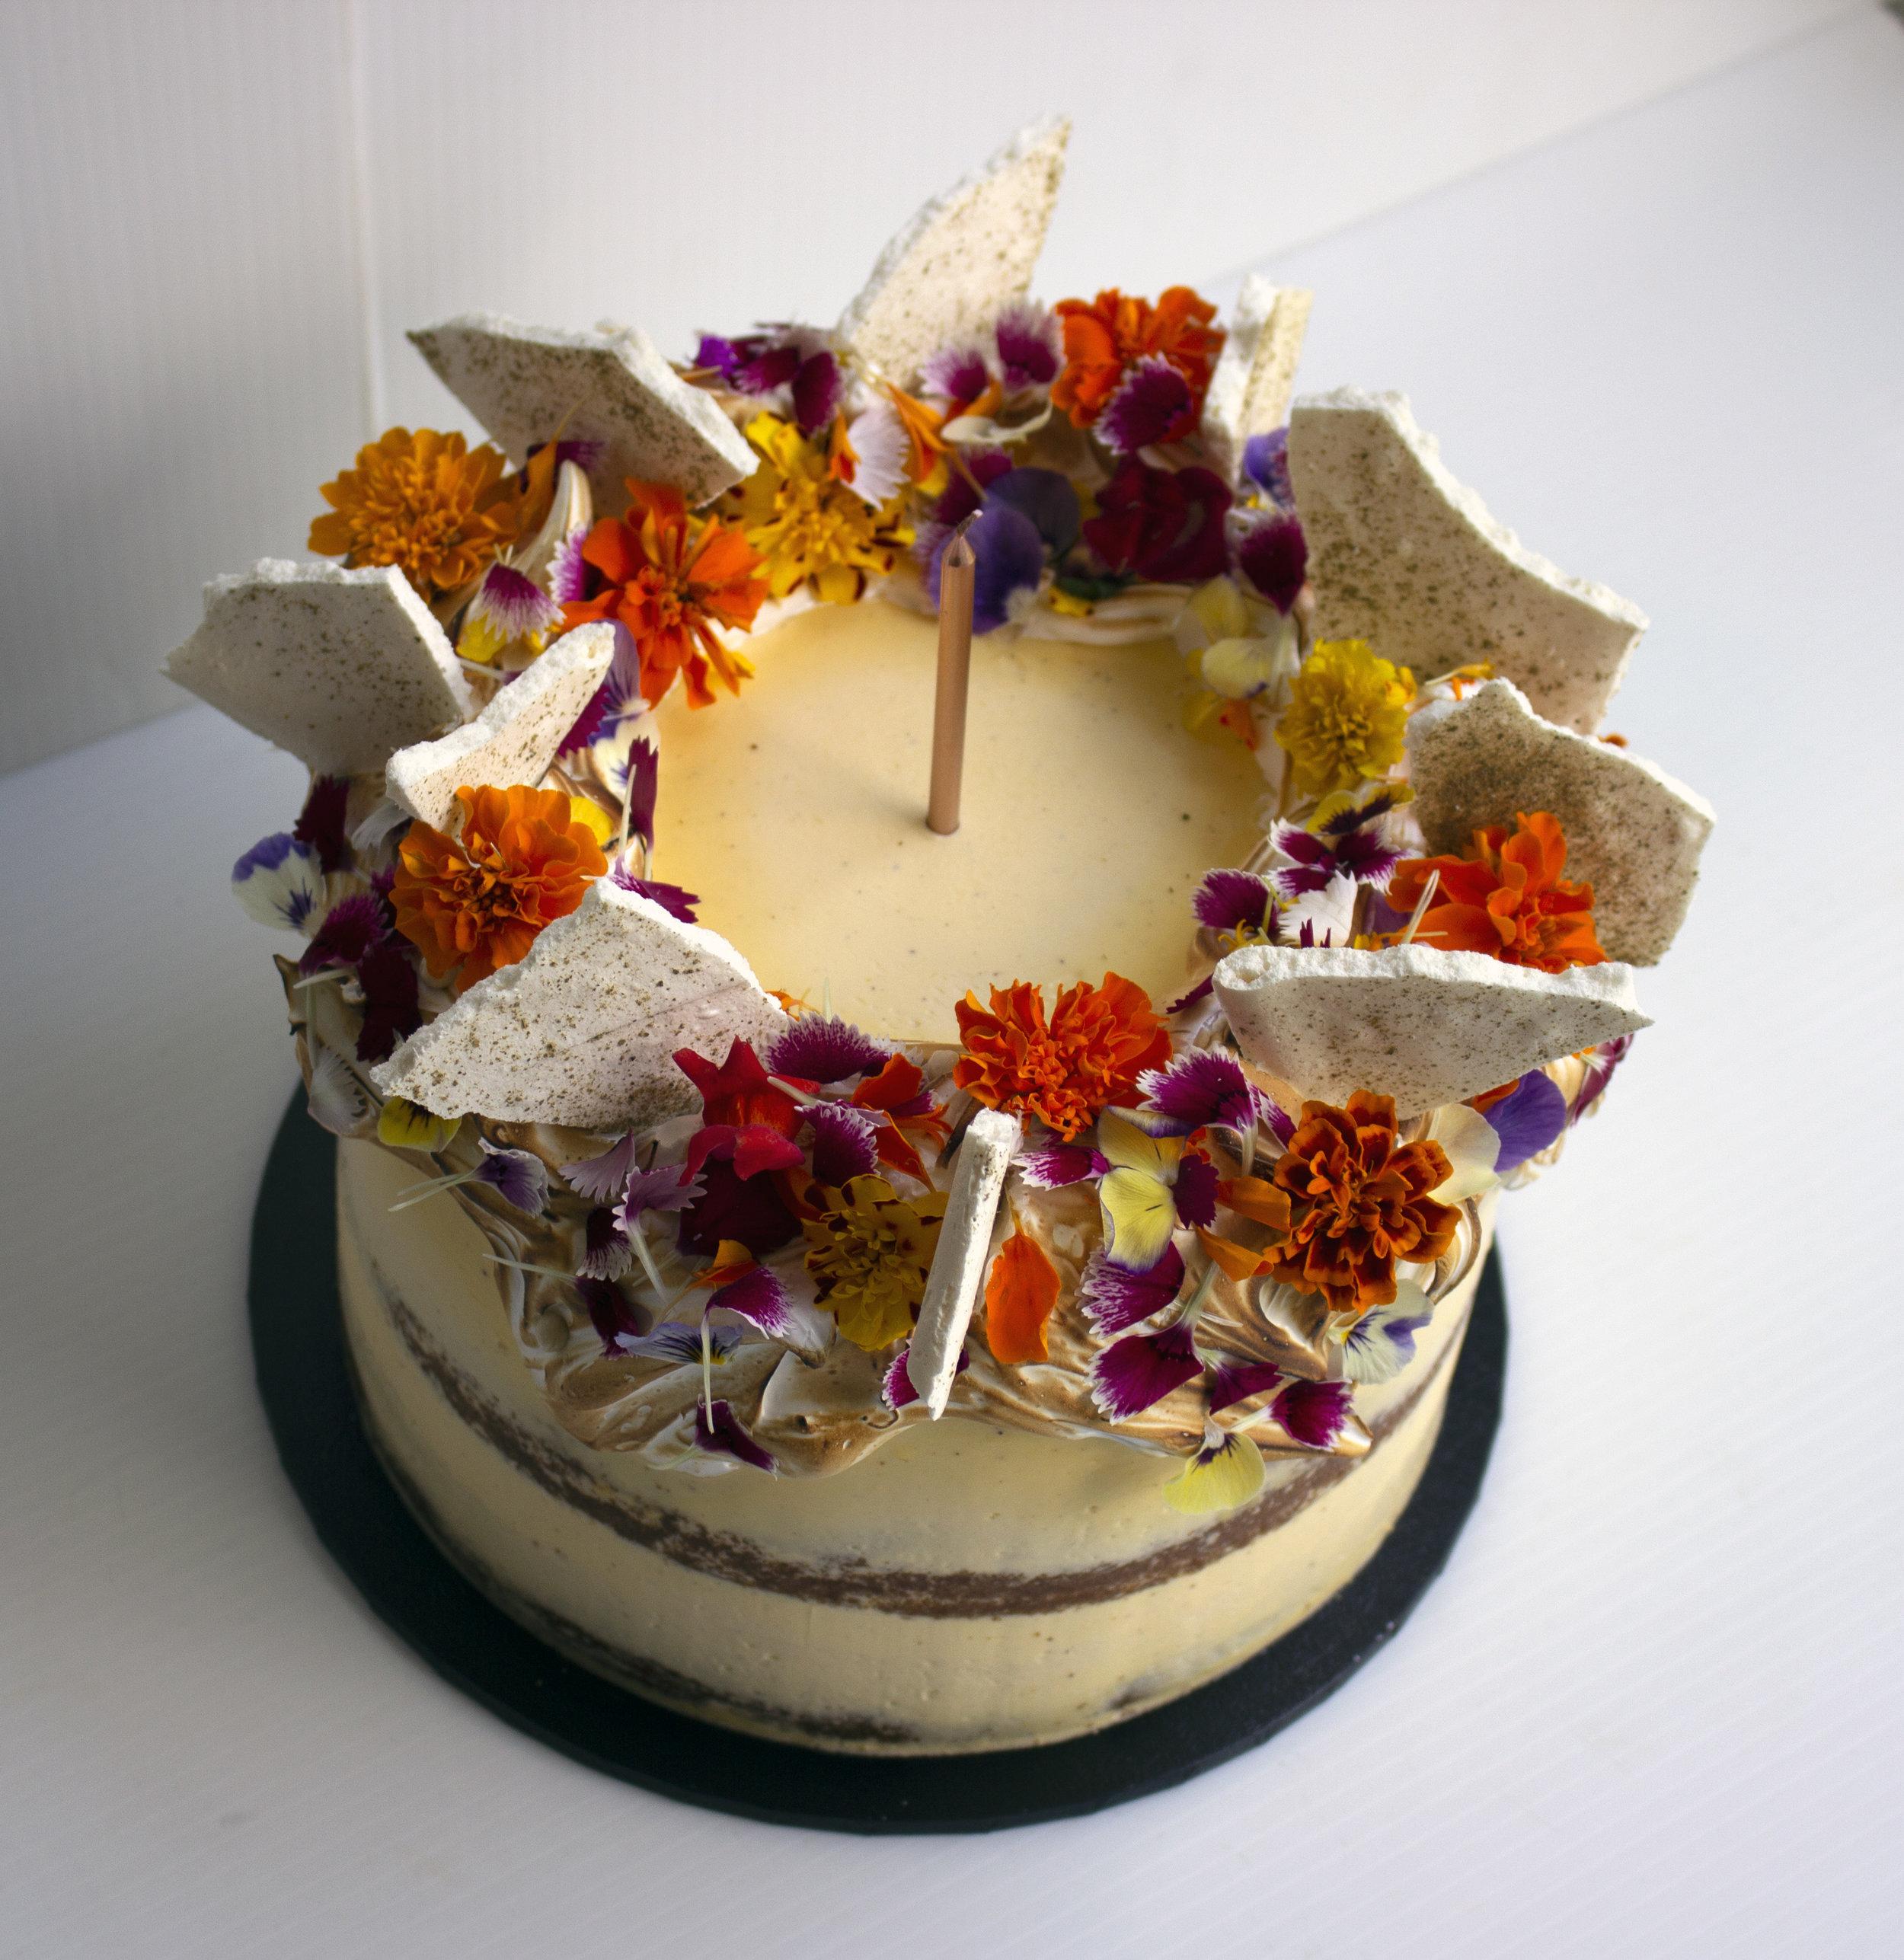 cake147.jpg